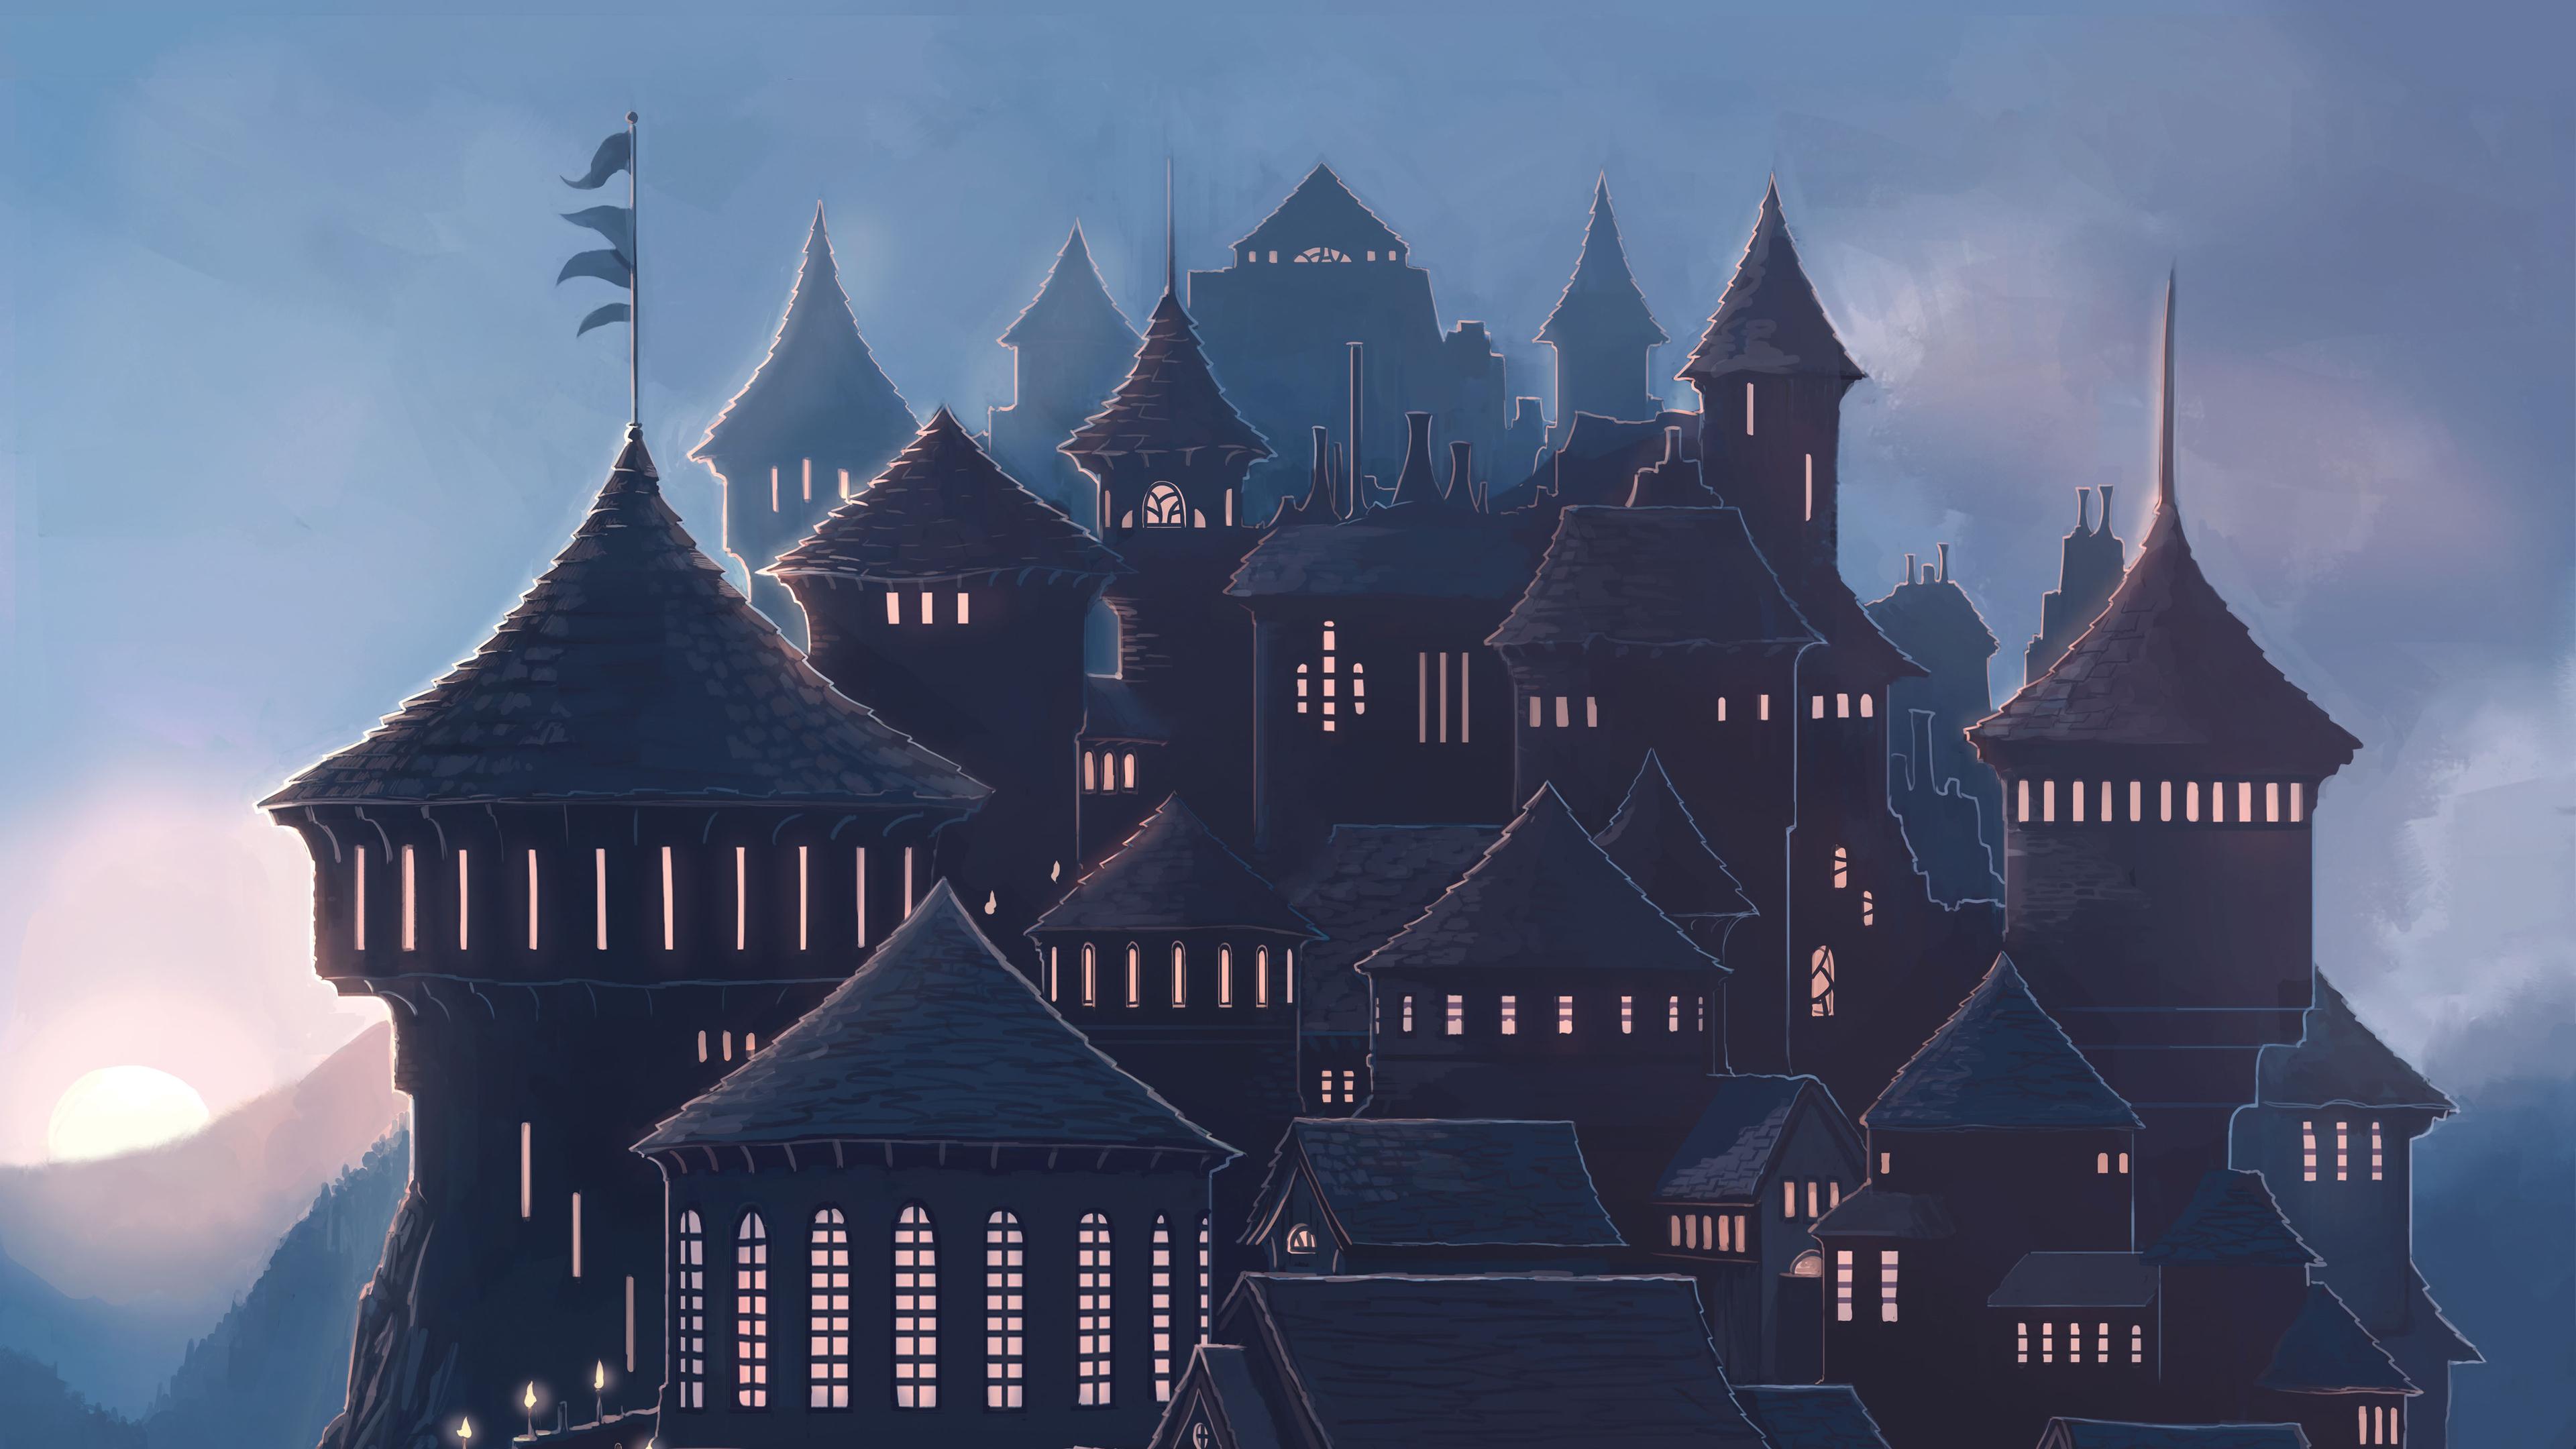 hogwarts harry potter school 4k 1540751299 - Hogwarts Harry Potter School 4k - hd-wallpapers, harry potter wallpapers, digital art wallpapers, artist wallpapers, 4k-wallpapers